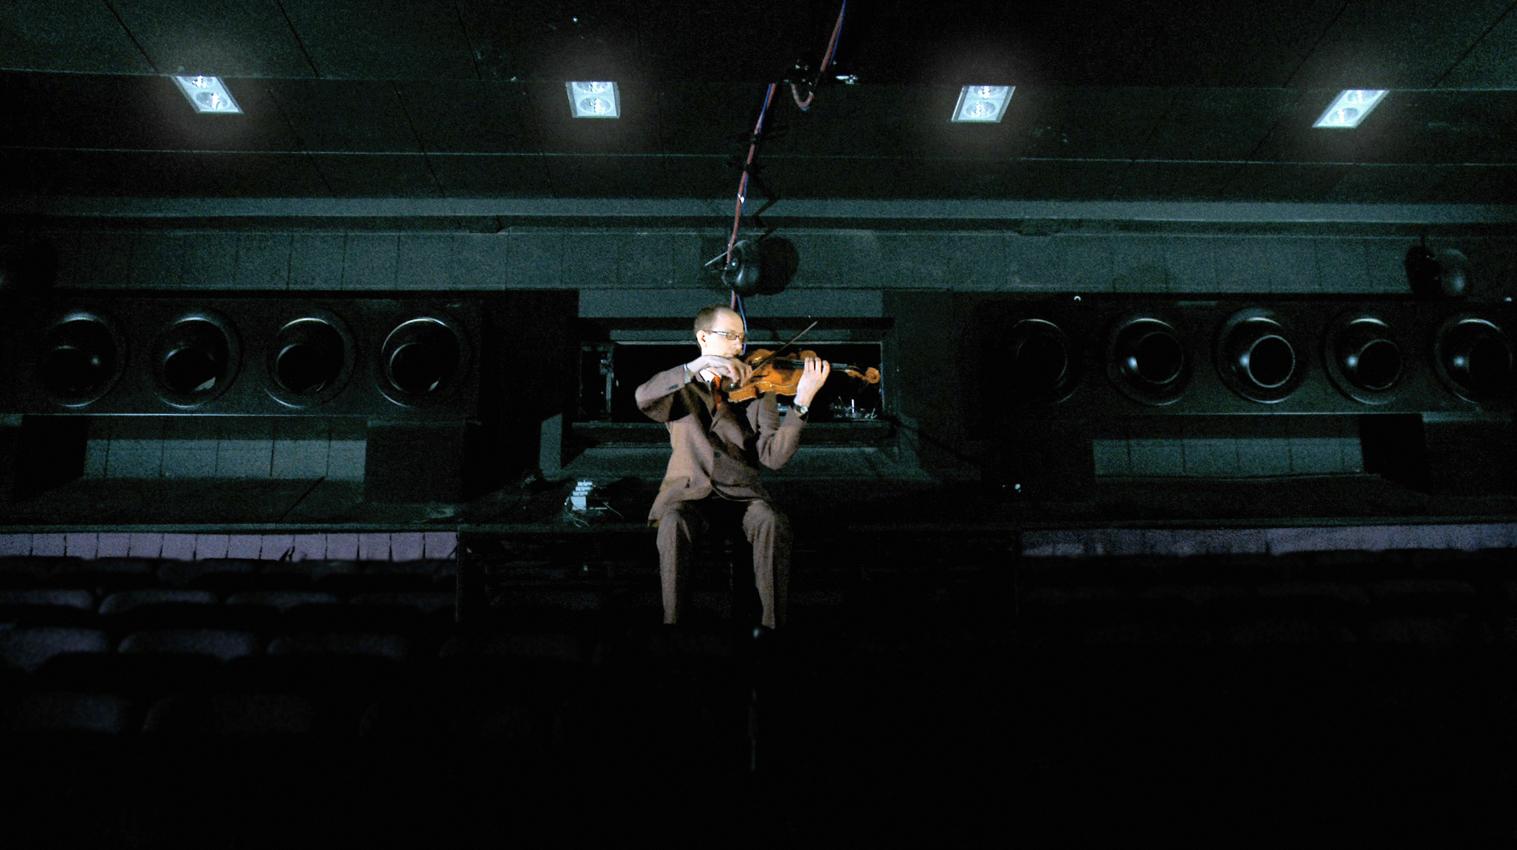 Xenon: the film (still), 2012. Feat. Conall Gleeson.